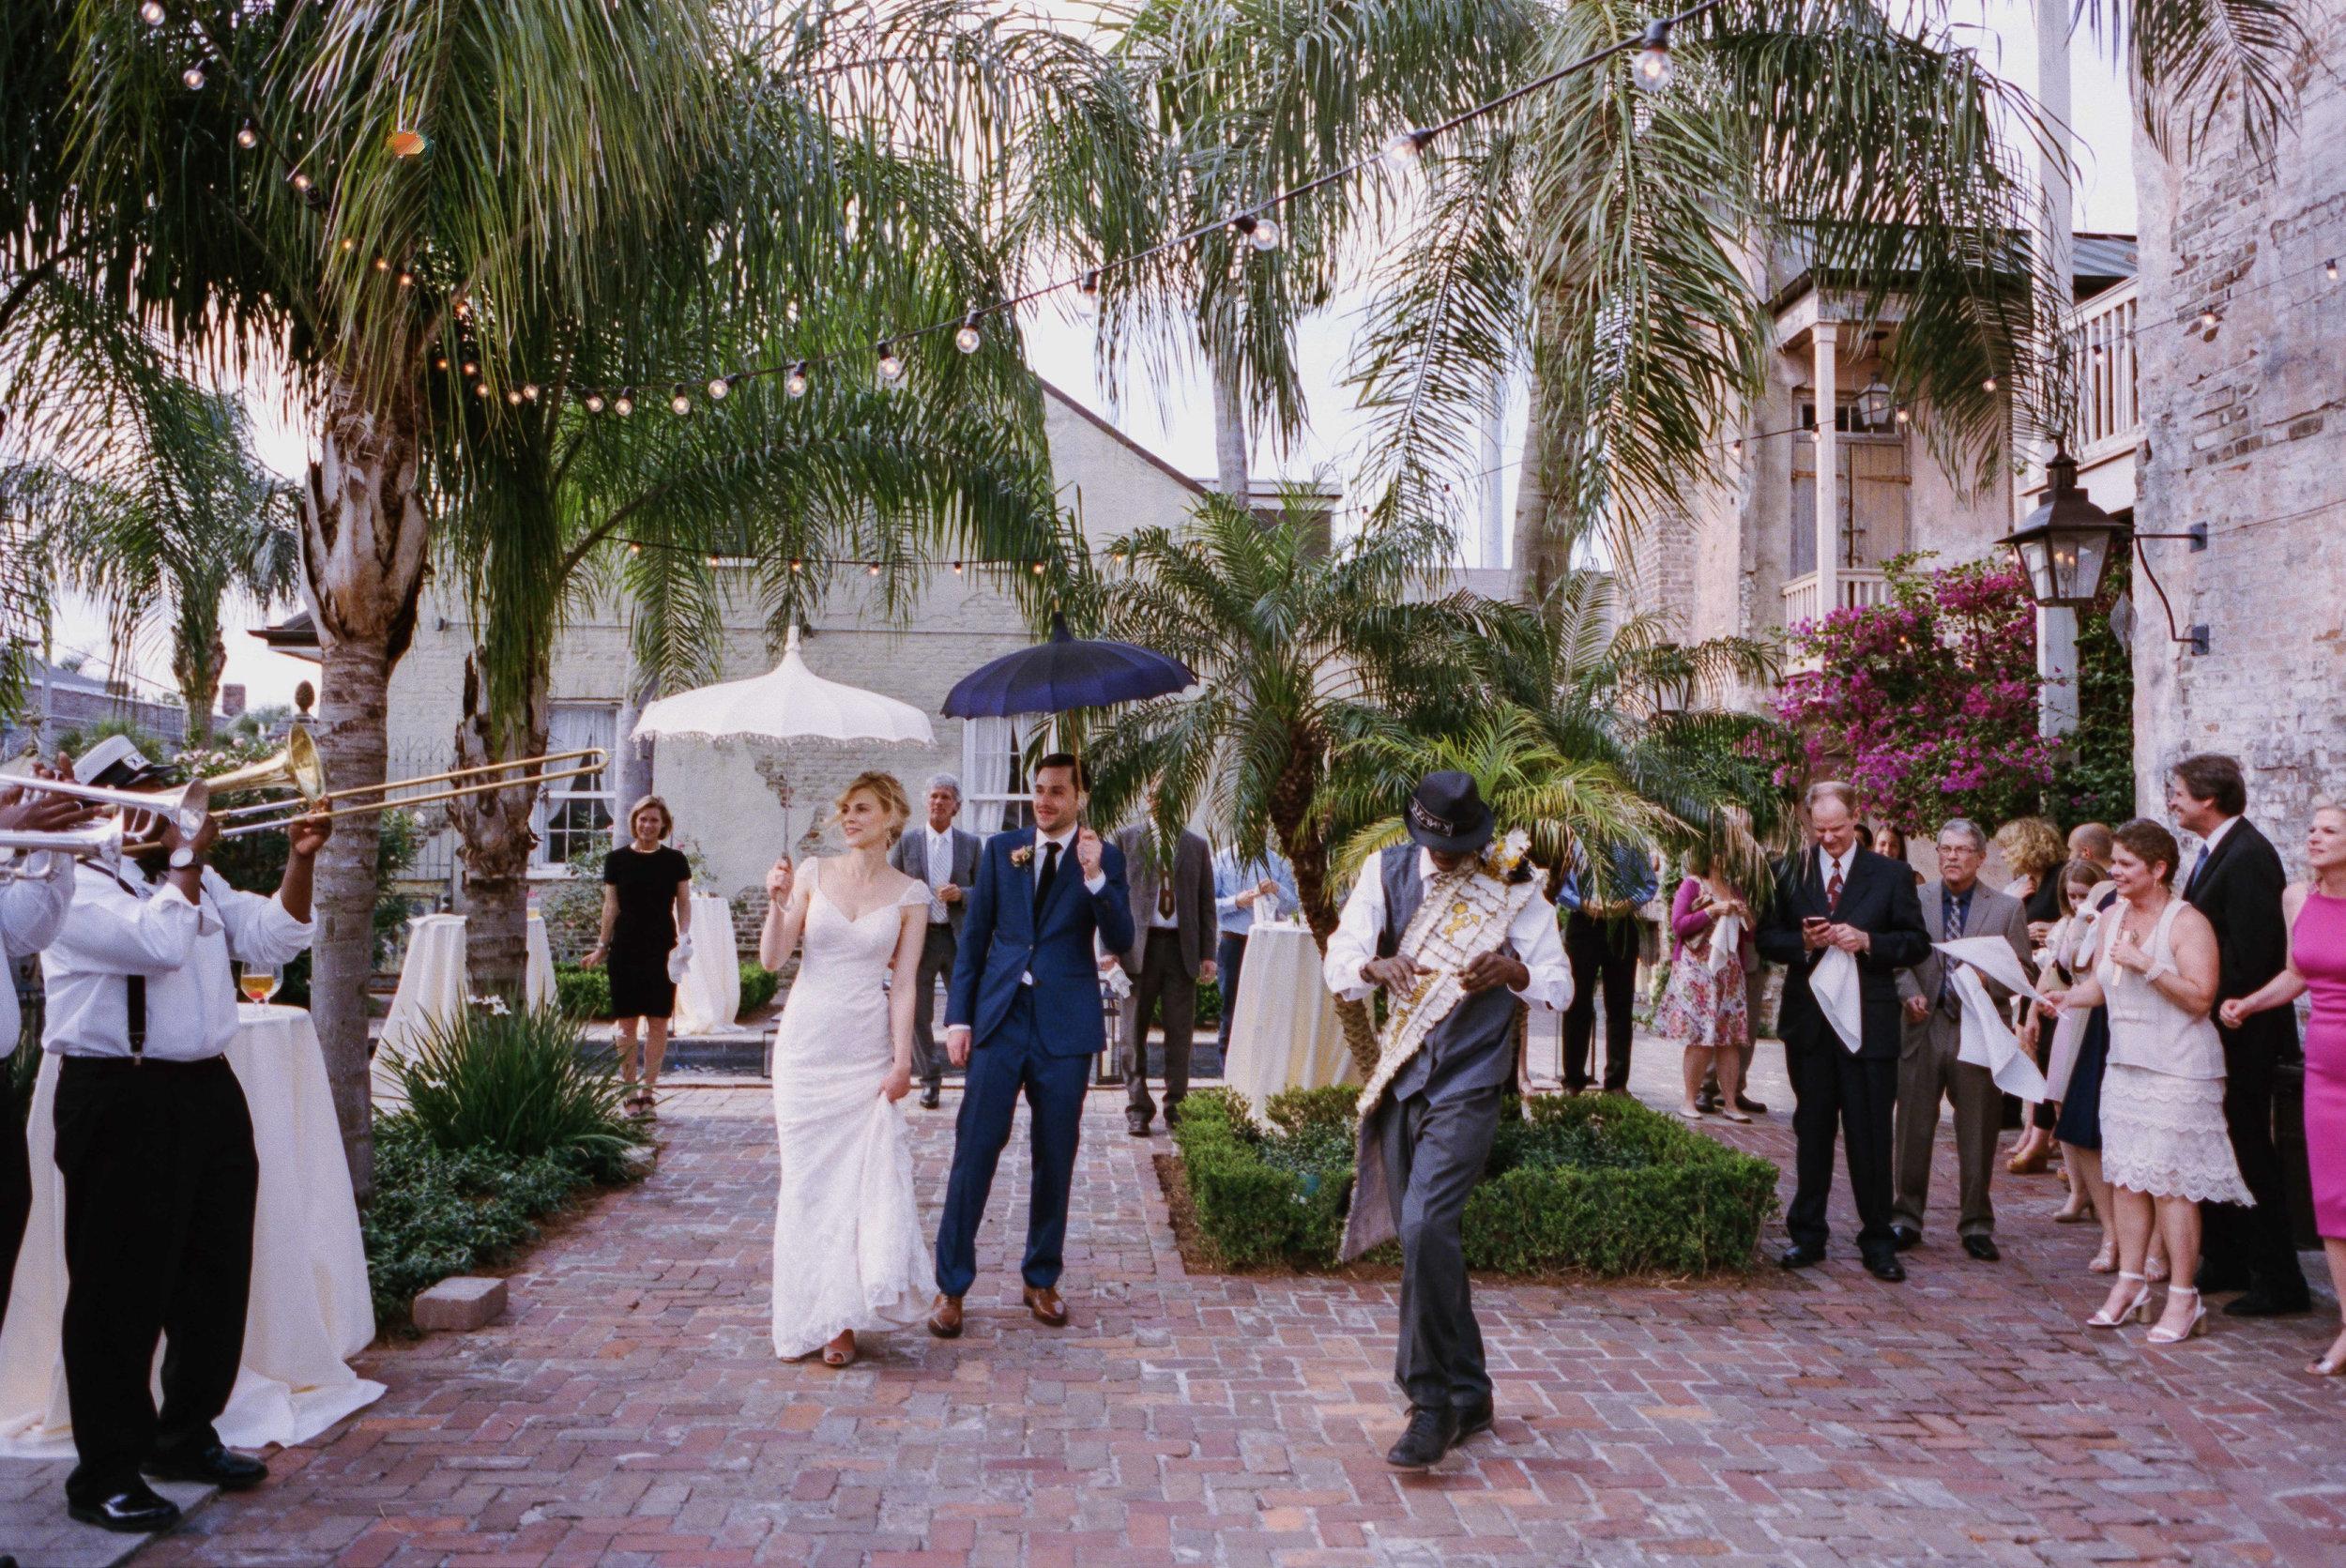 portra_400_film_wedding_chellise_michael_photography-16.jpg